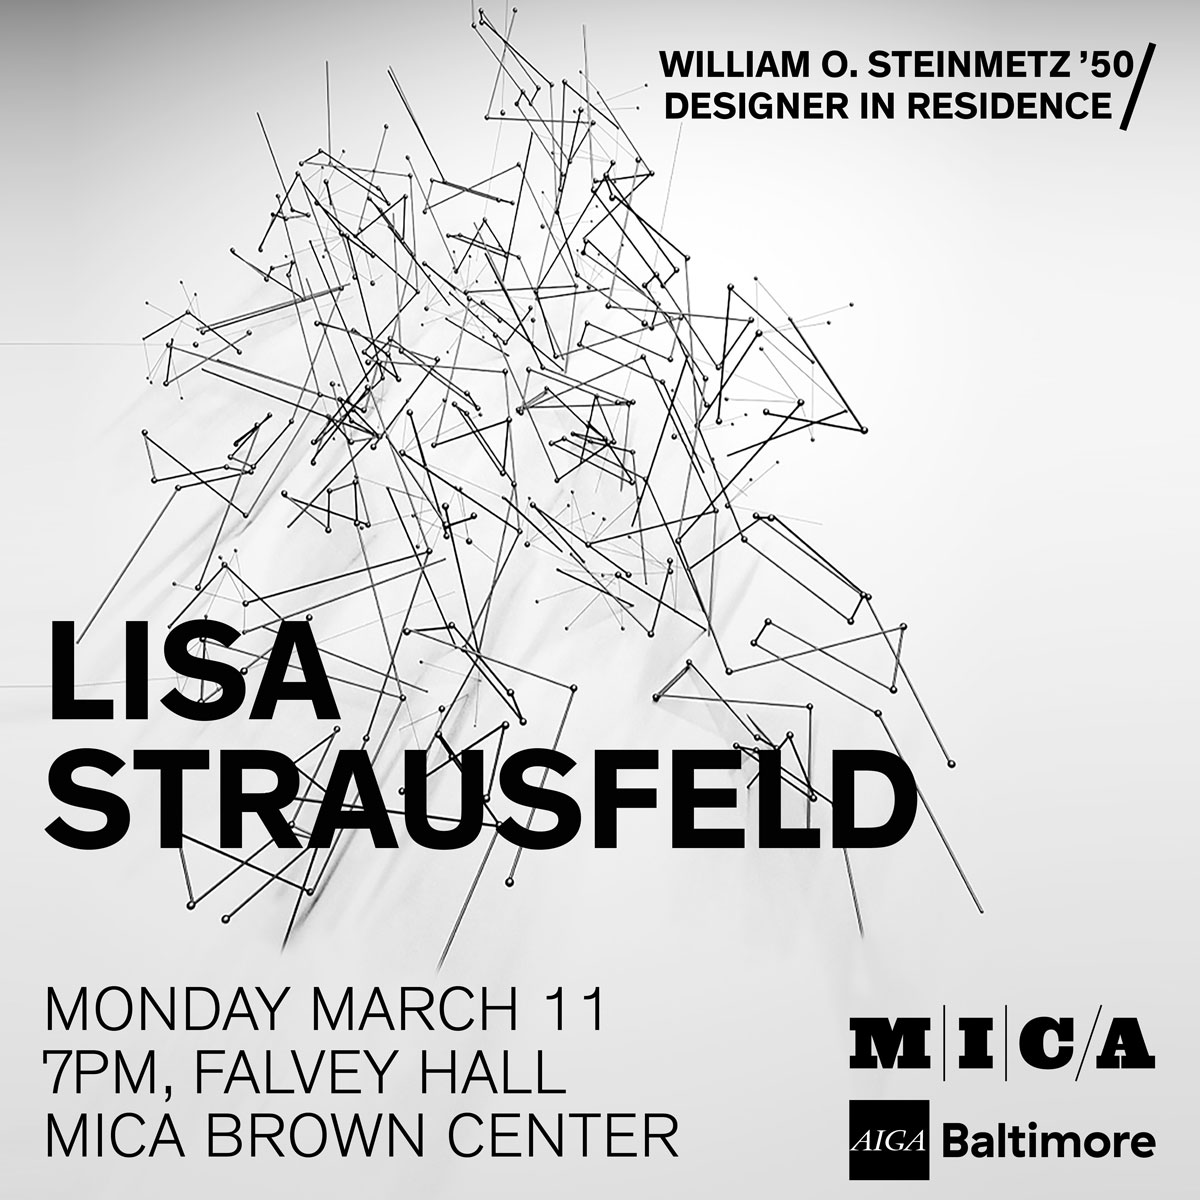 Lisa Strausfeld design lecture at MICA